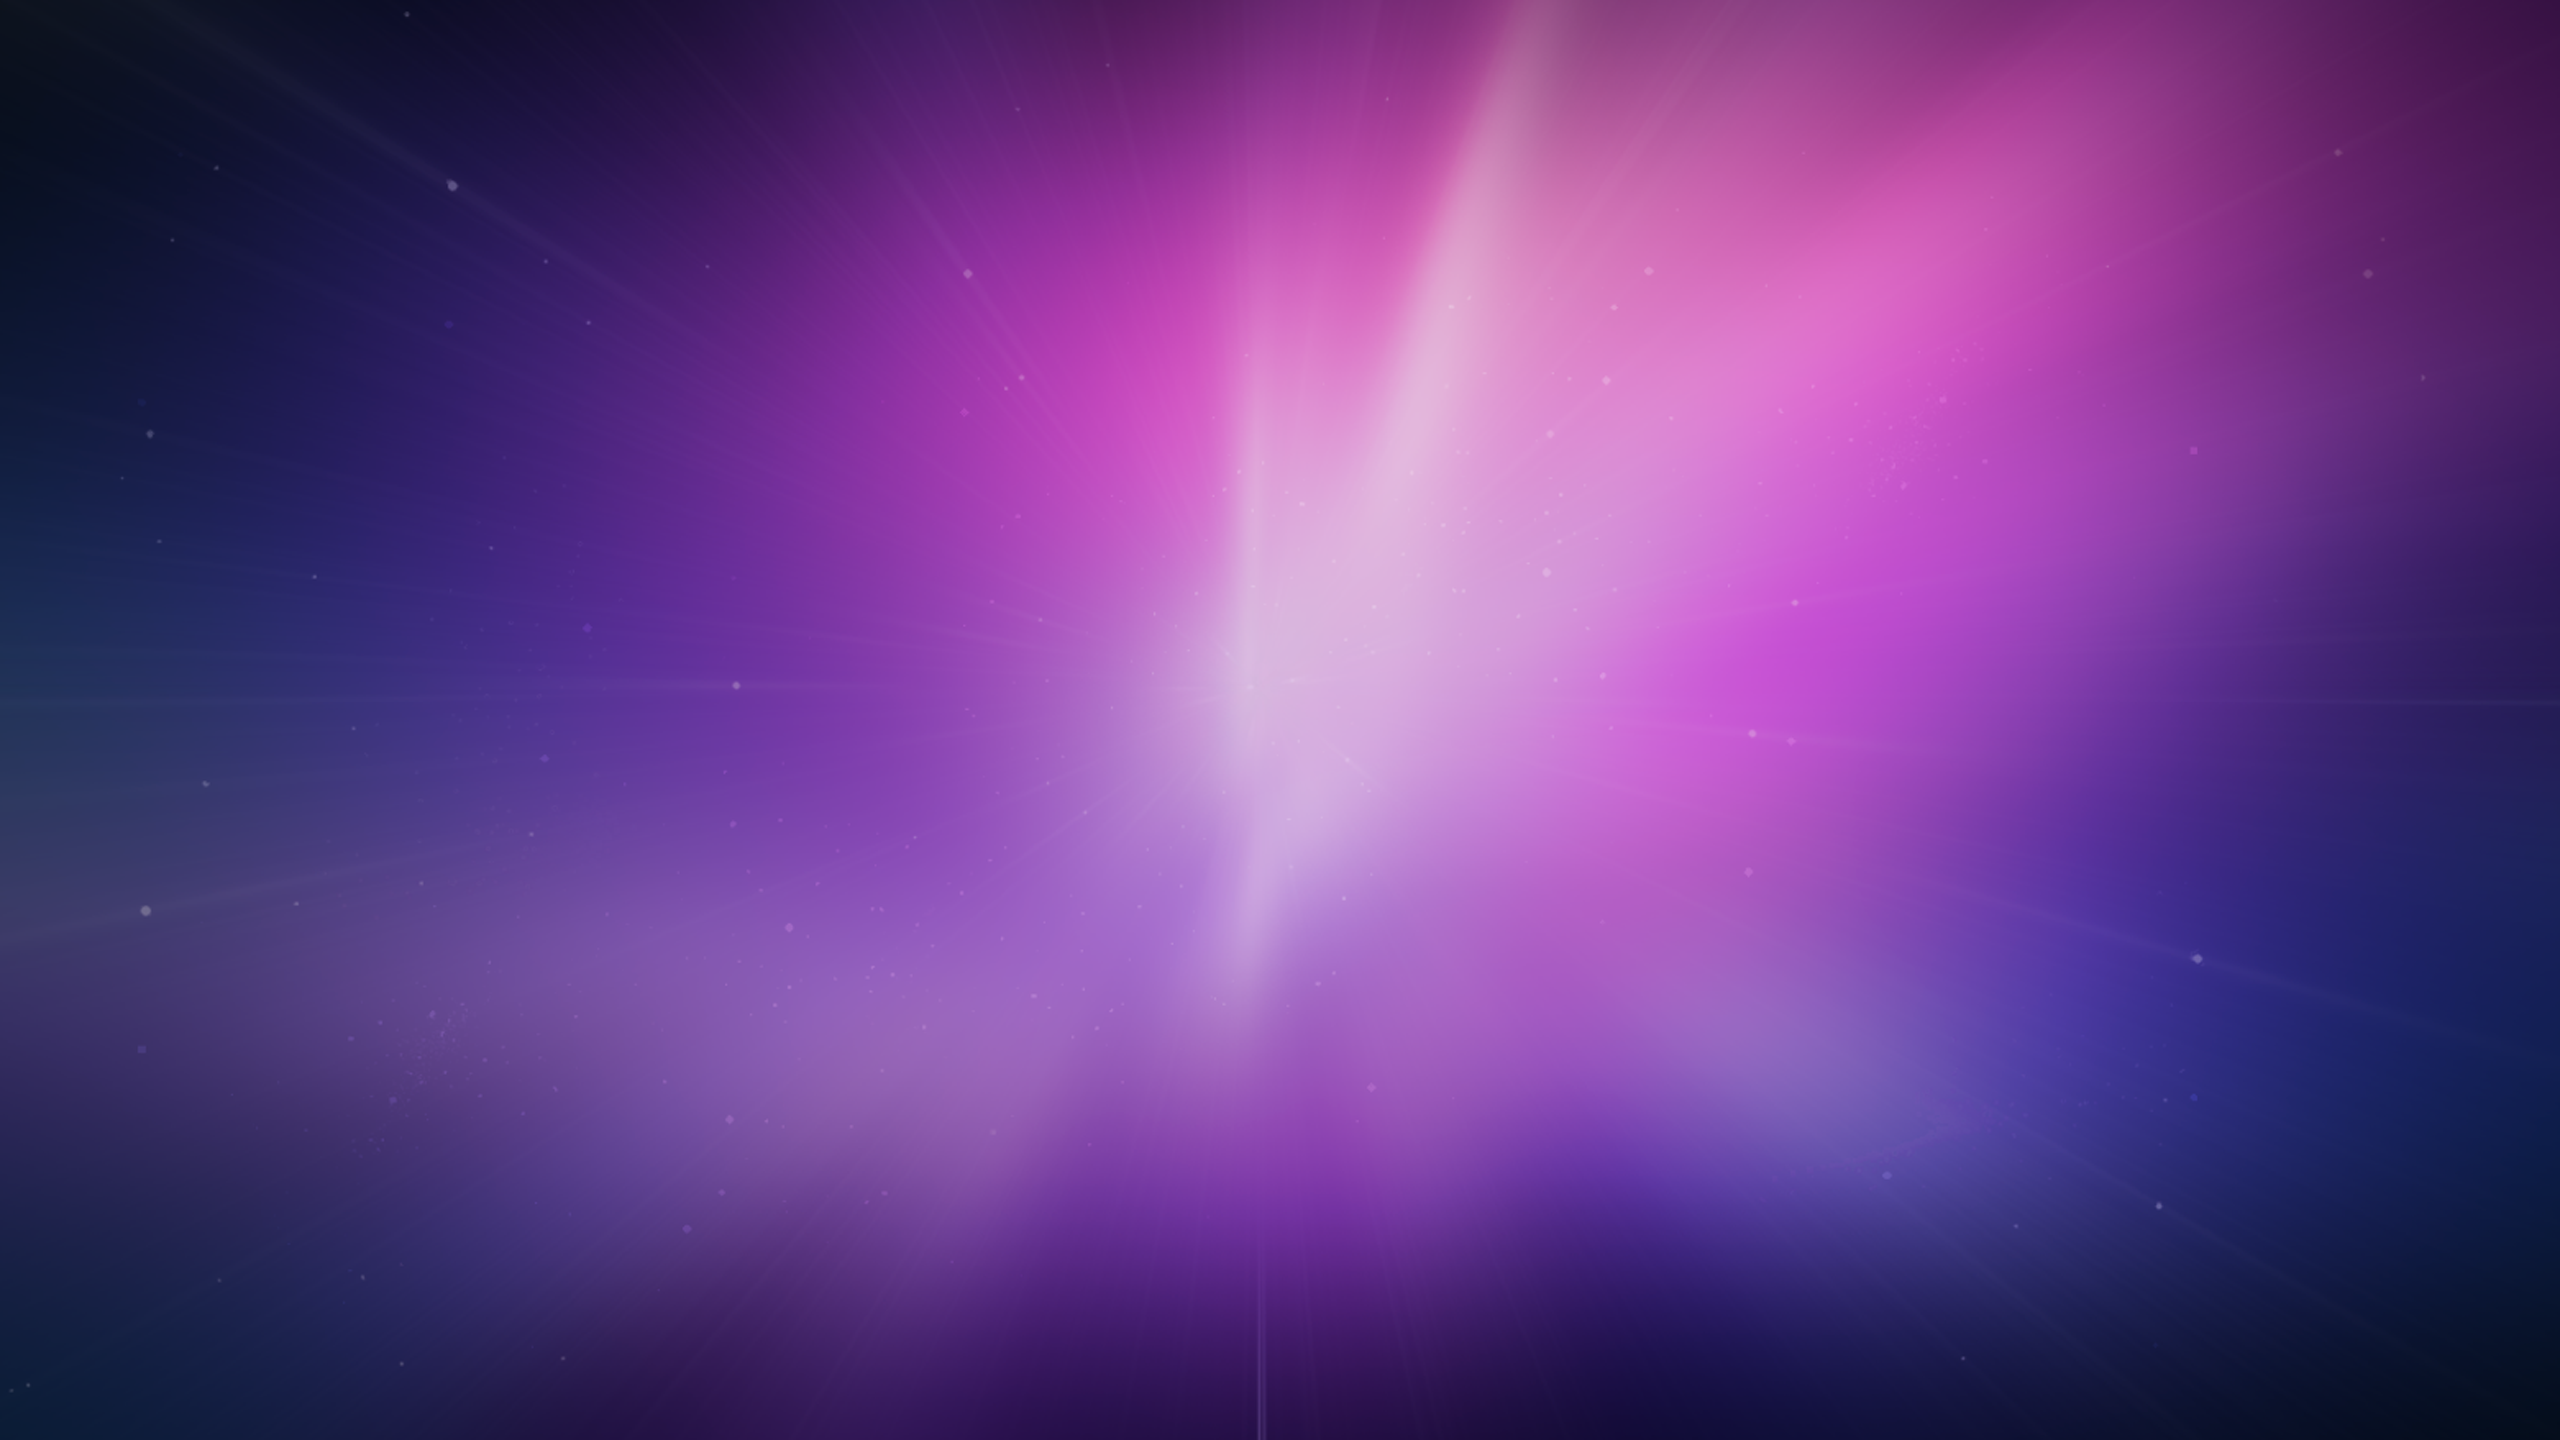 Wallpaper download mac - Mac Os X Snow Leopard Wallpapers Download